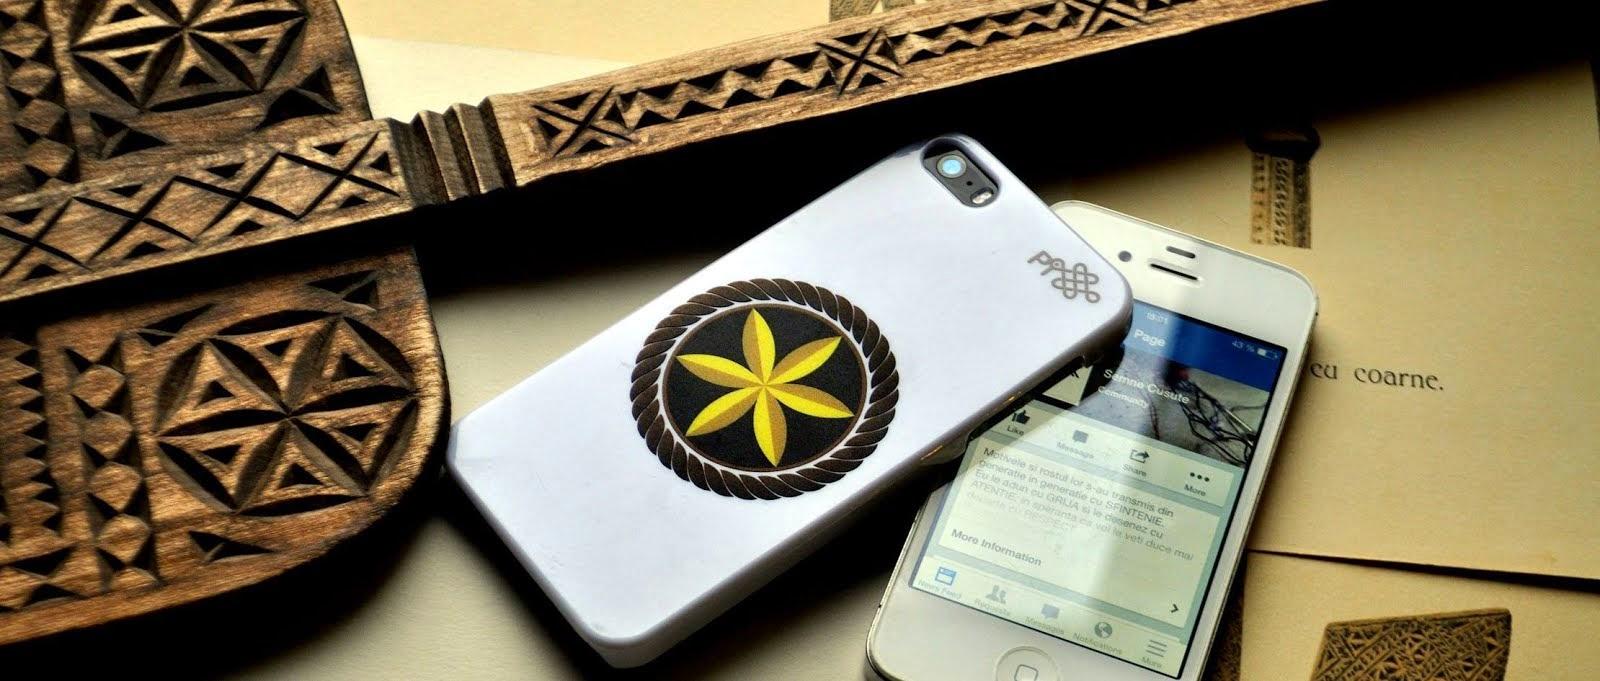 iconinc phone cases